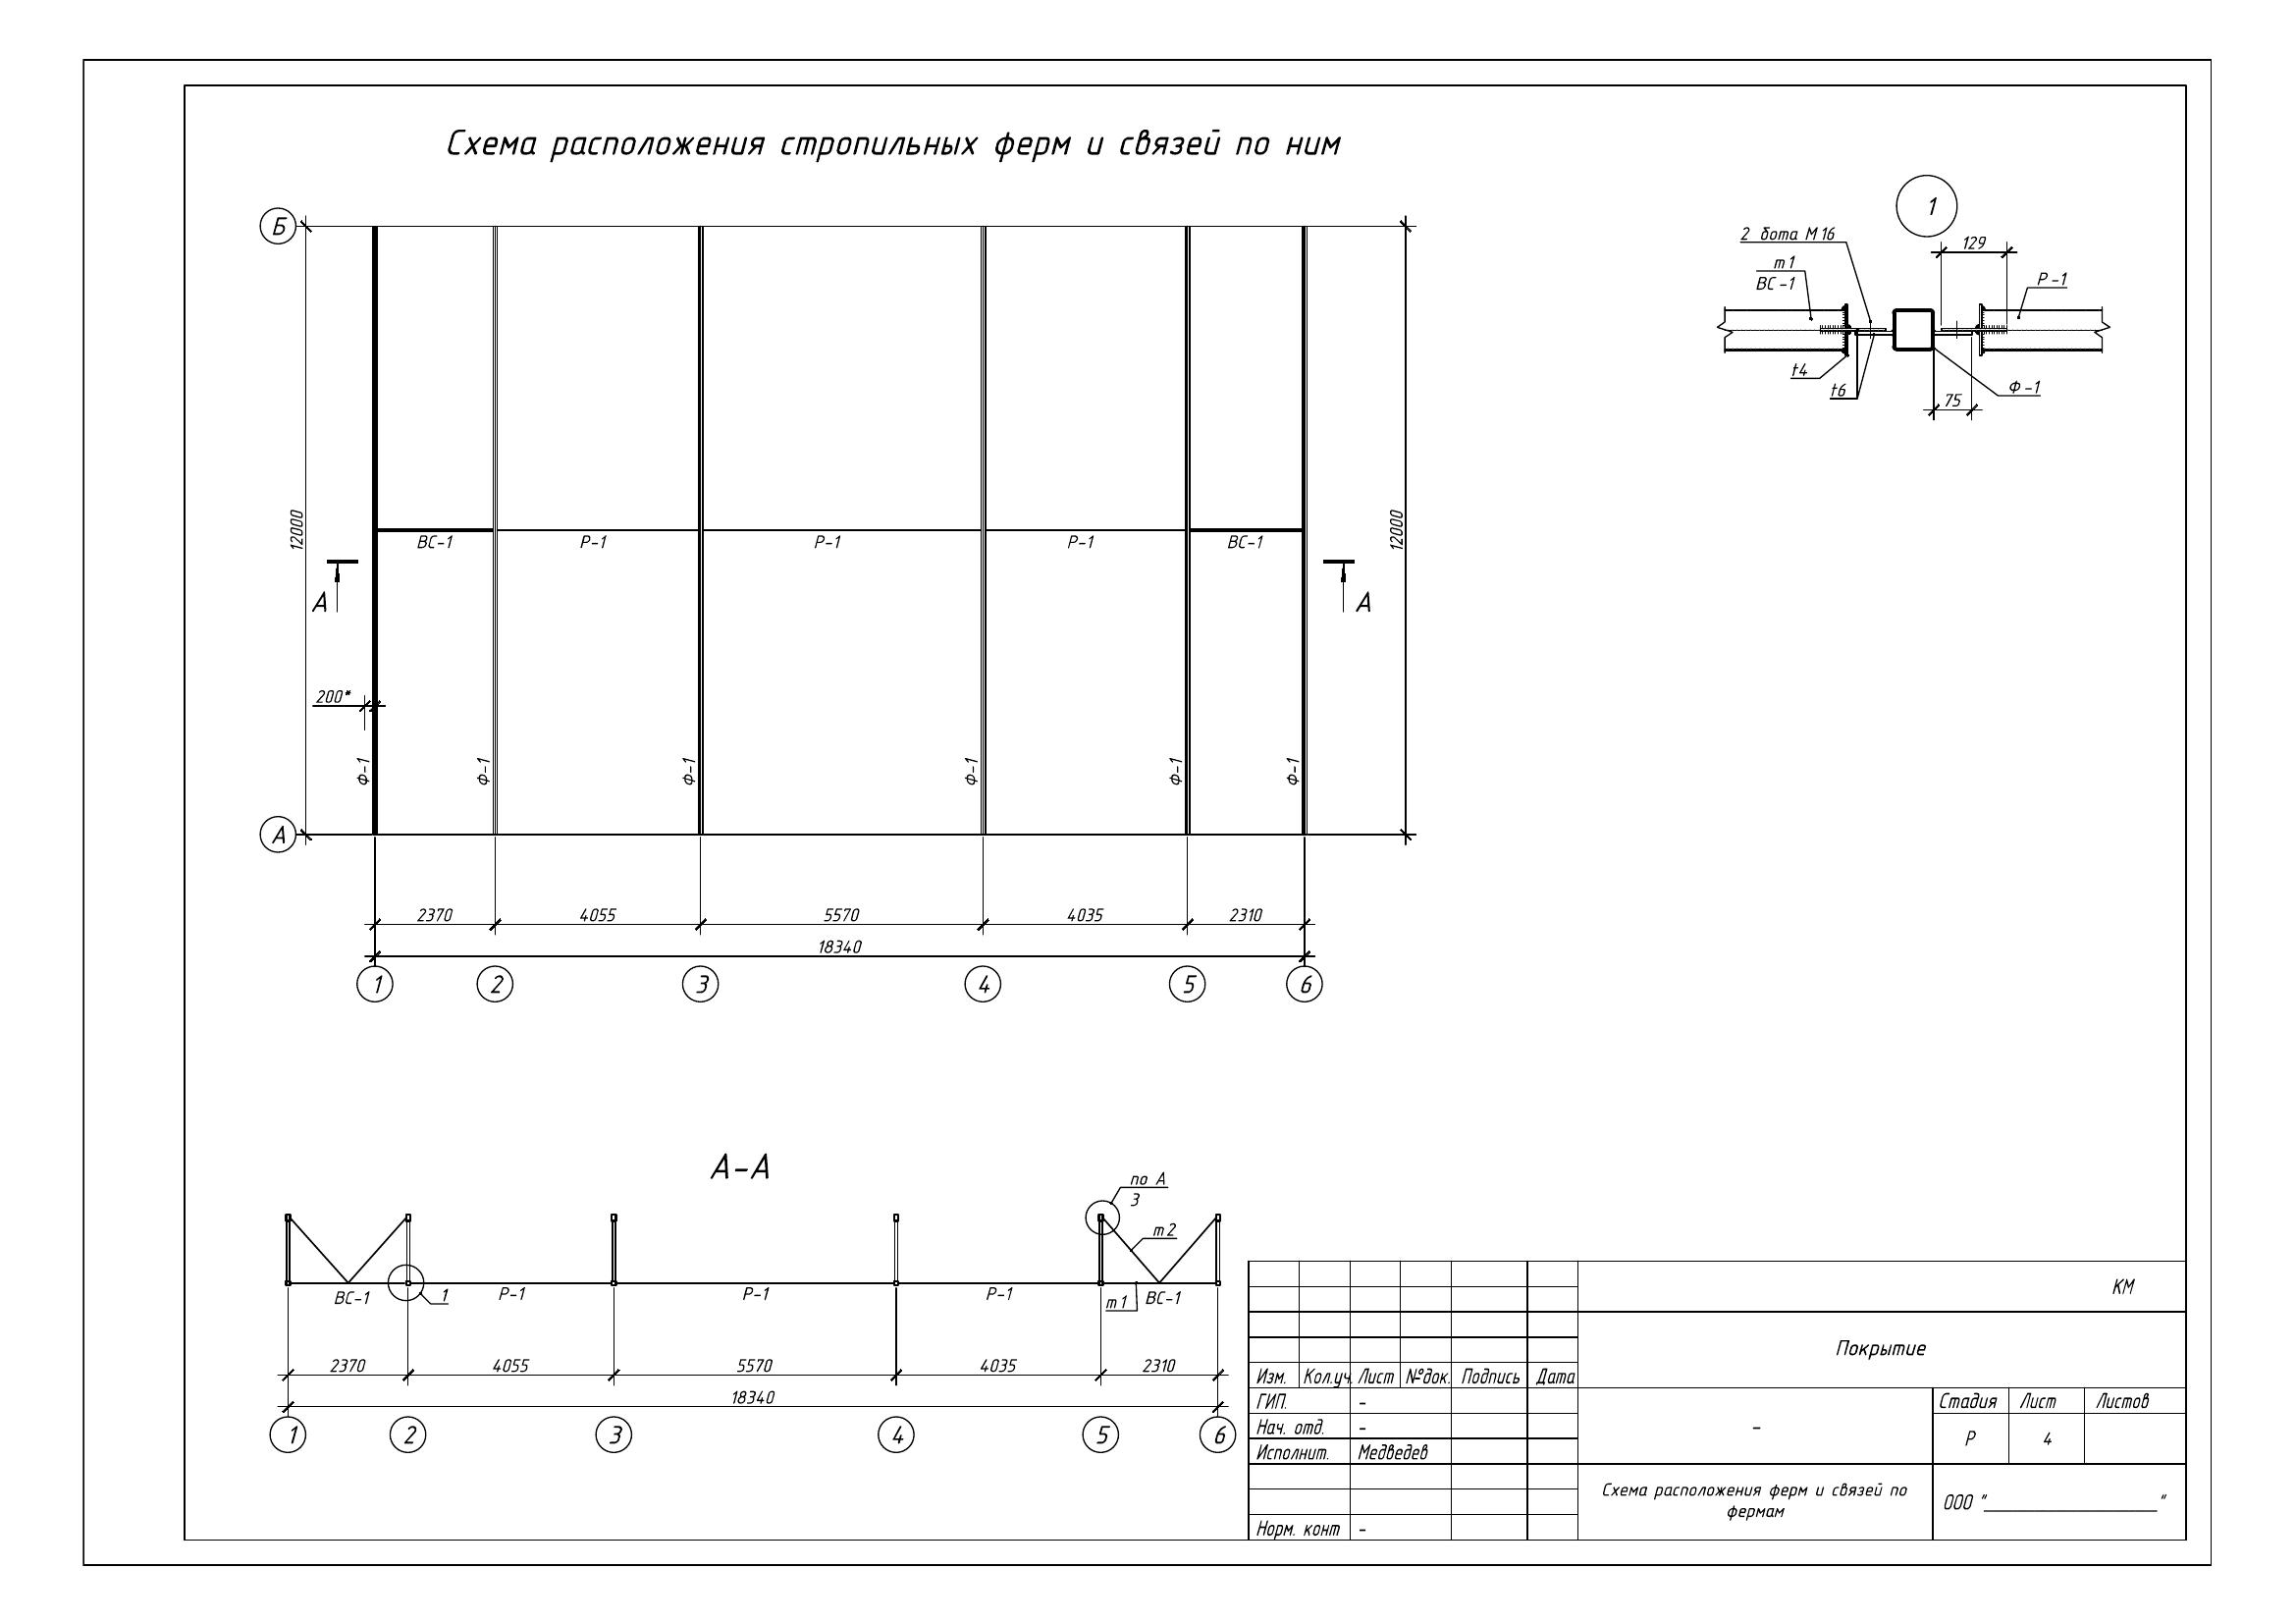 Схема конструкций ферм